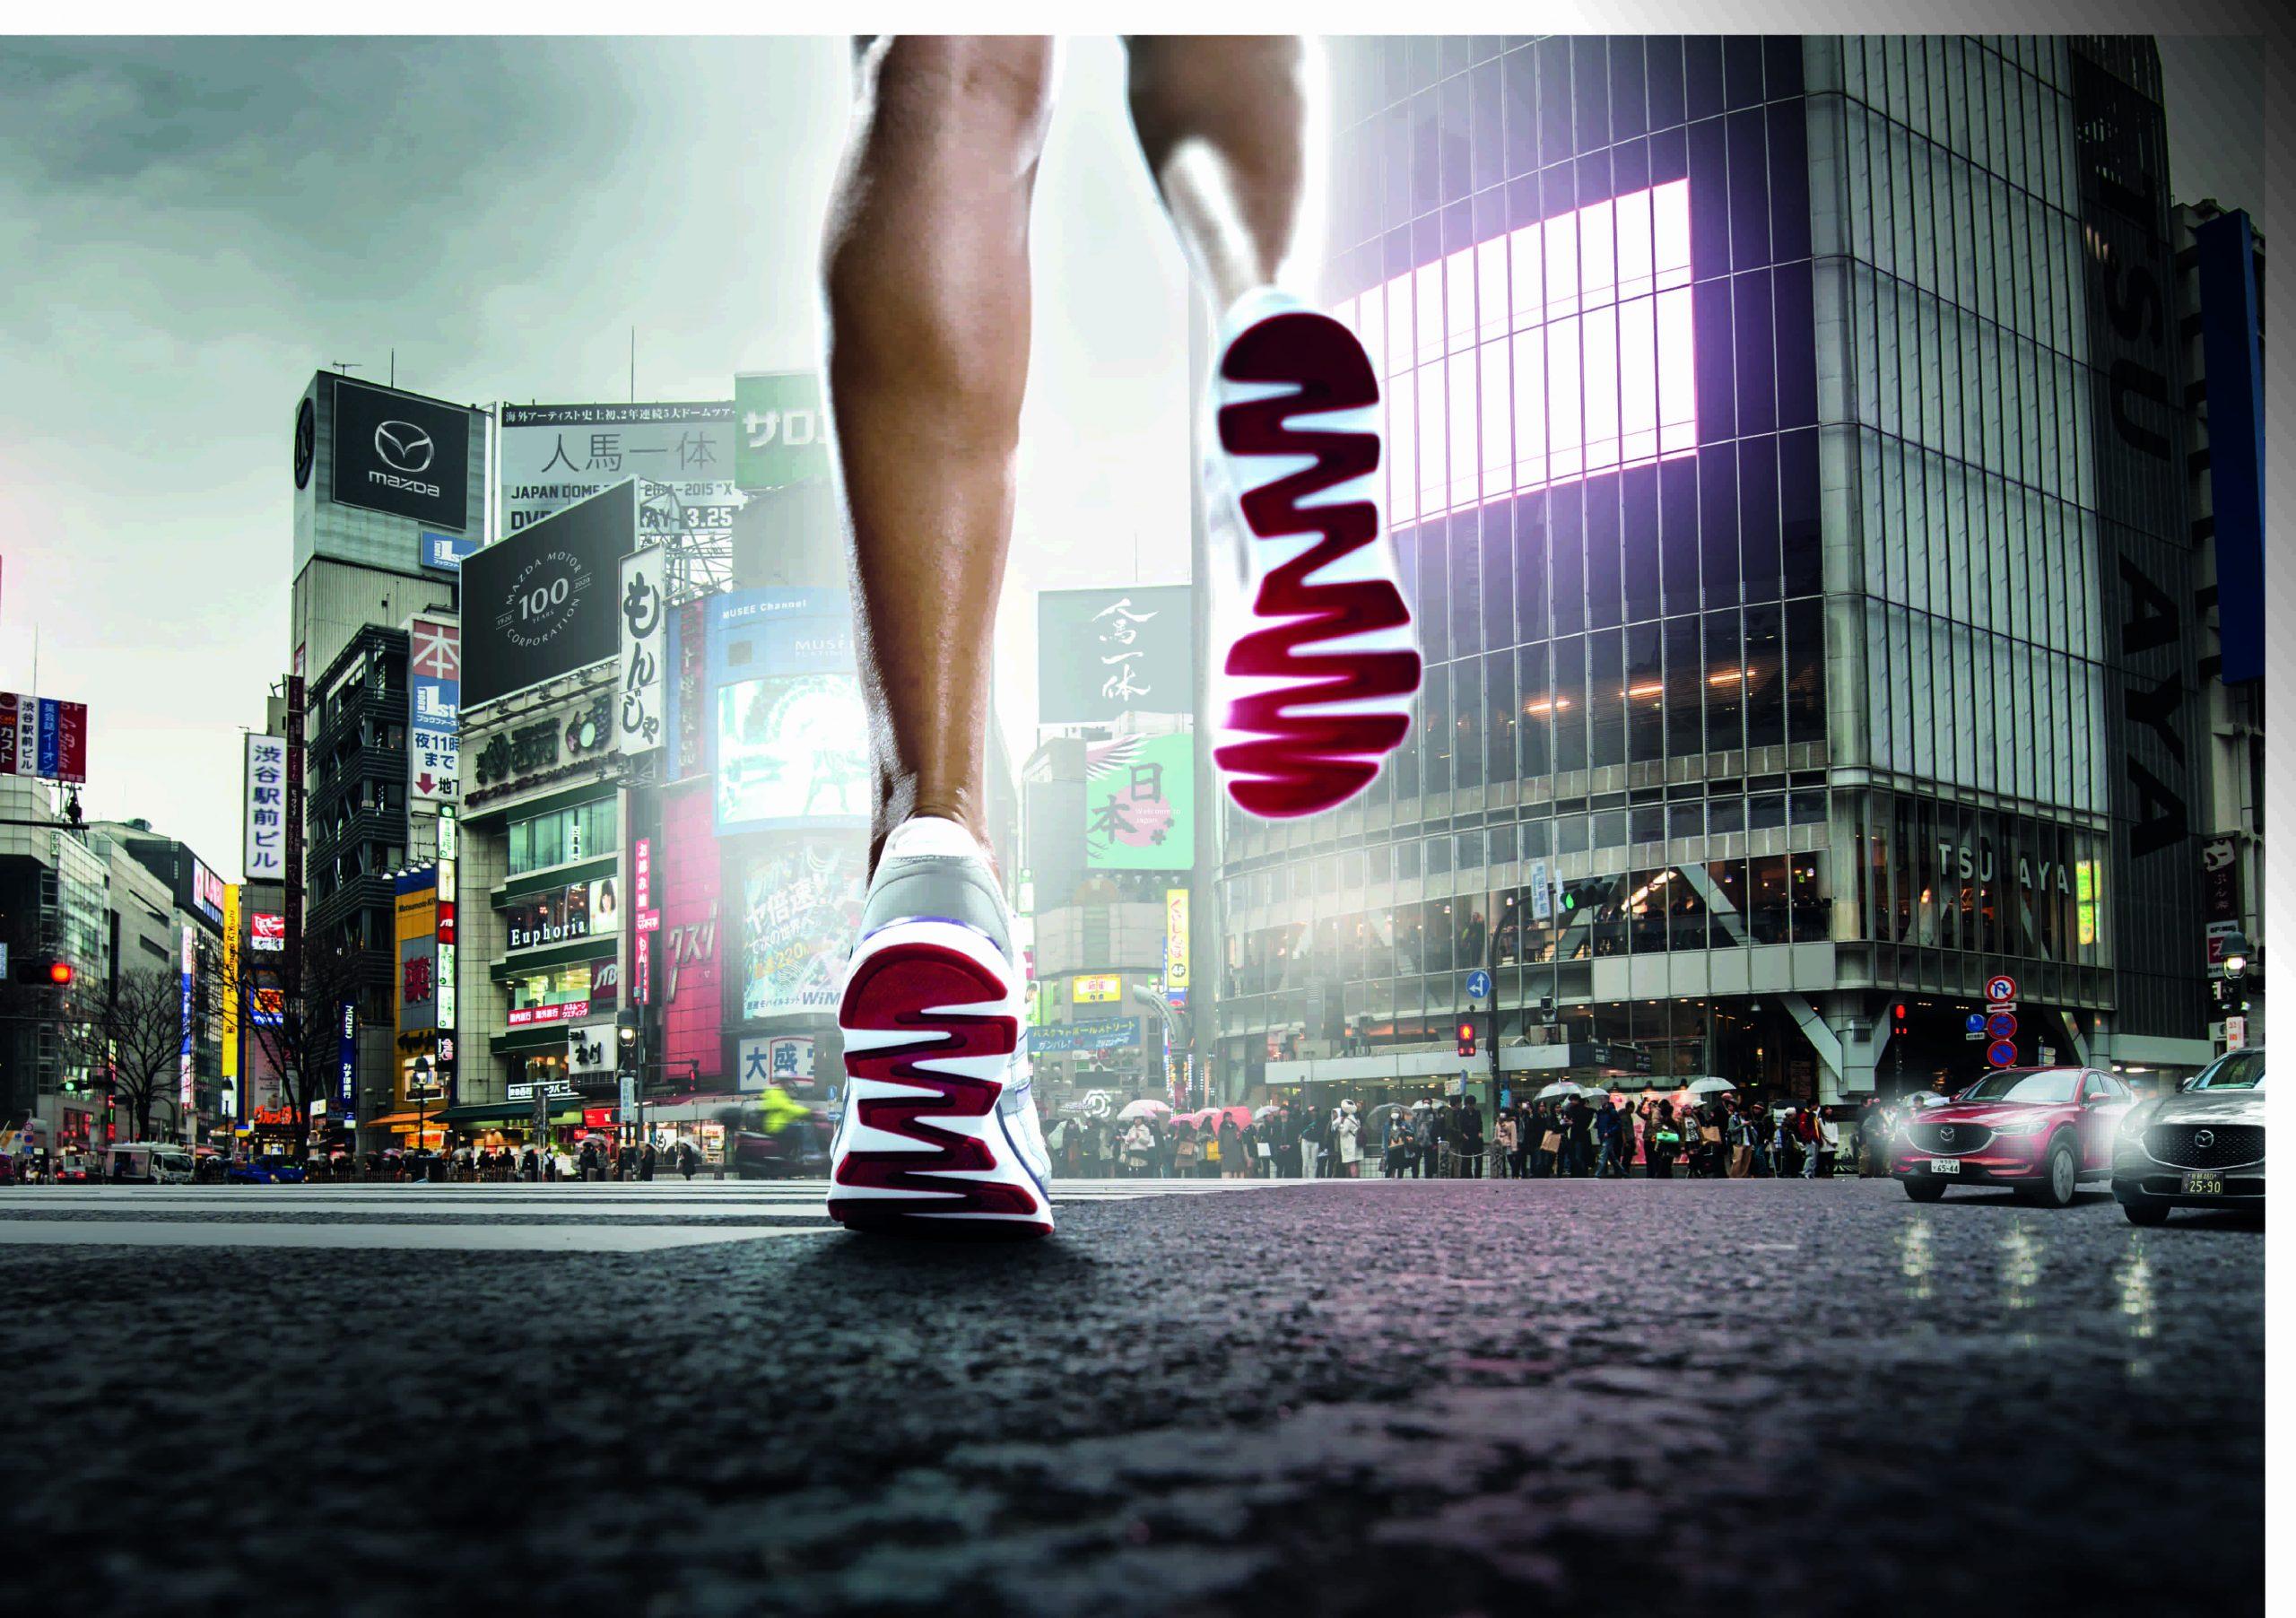 https://wangergarage.mazda.ch/wp-content/uploads/sites/26/2021/02/Run-to-Tokyo-Flyer-Sujet-min-scaled.jpg